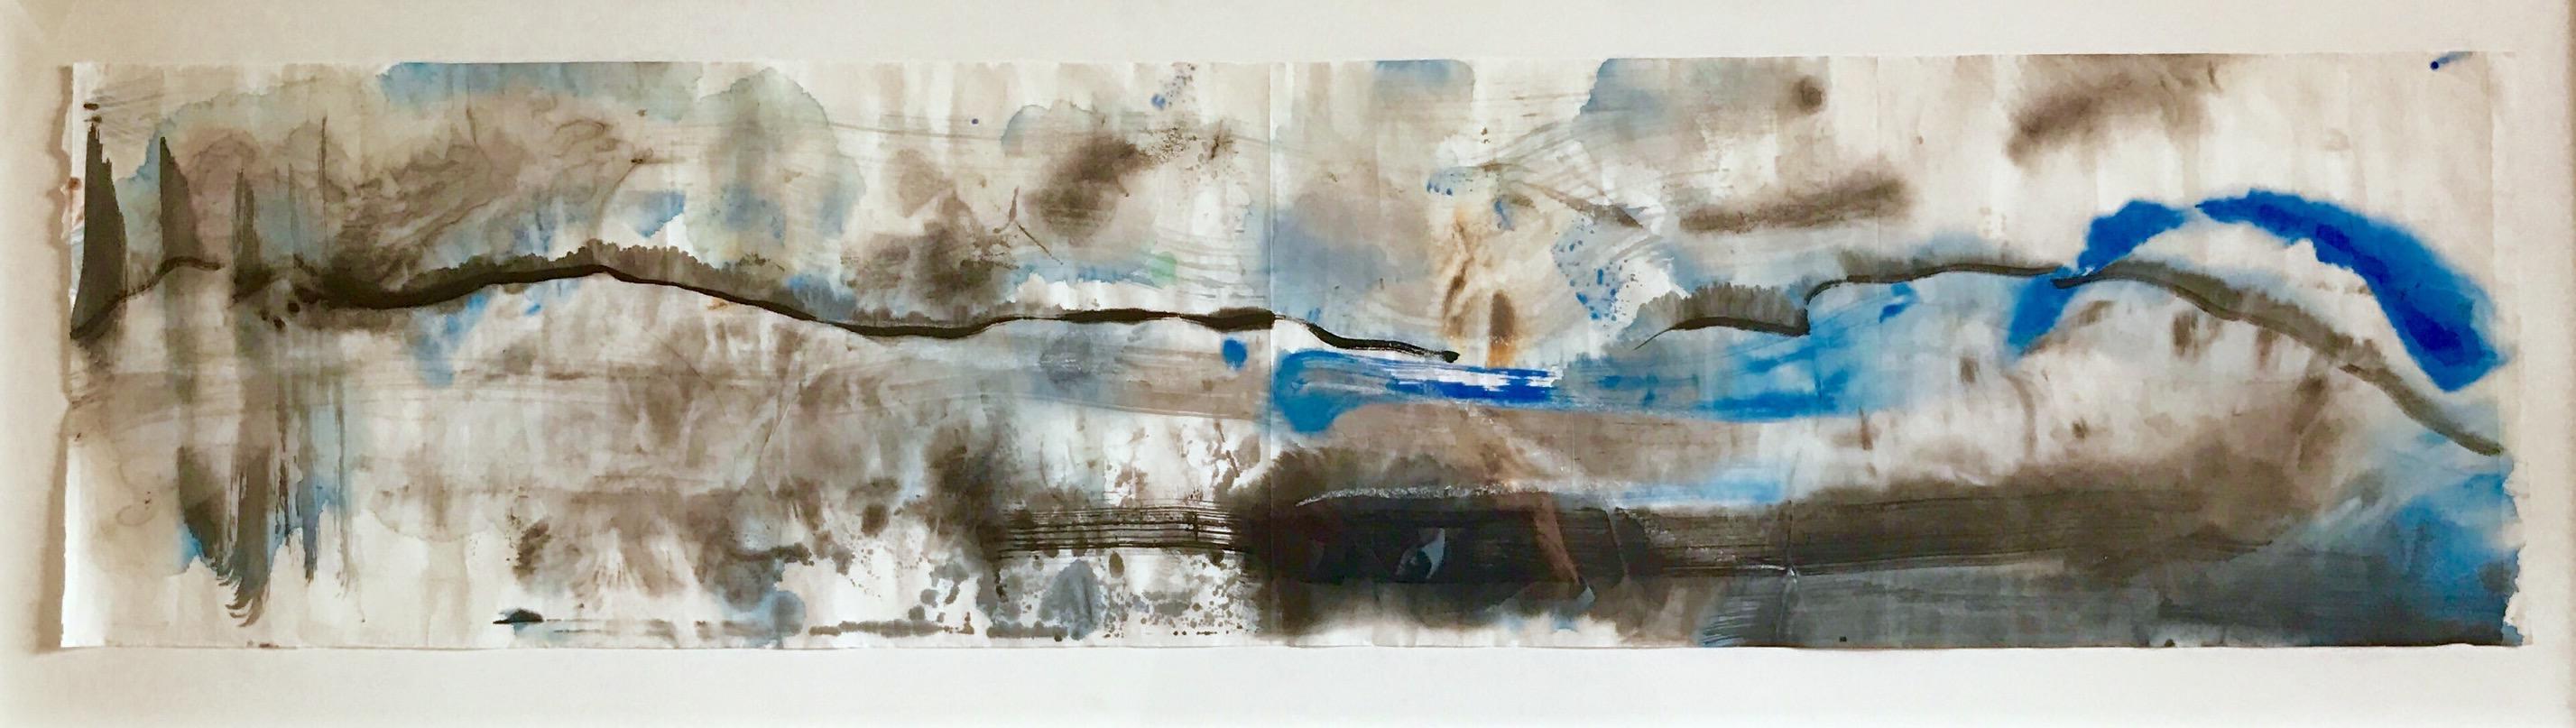 Ana Mejia's painting